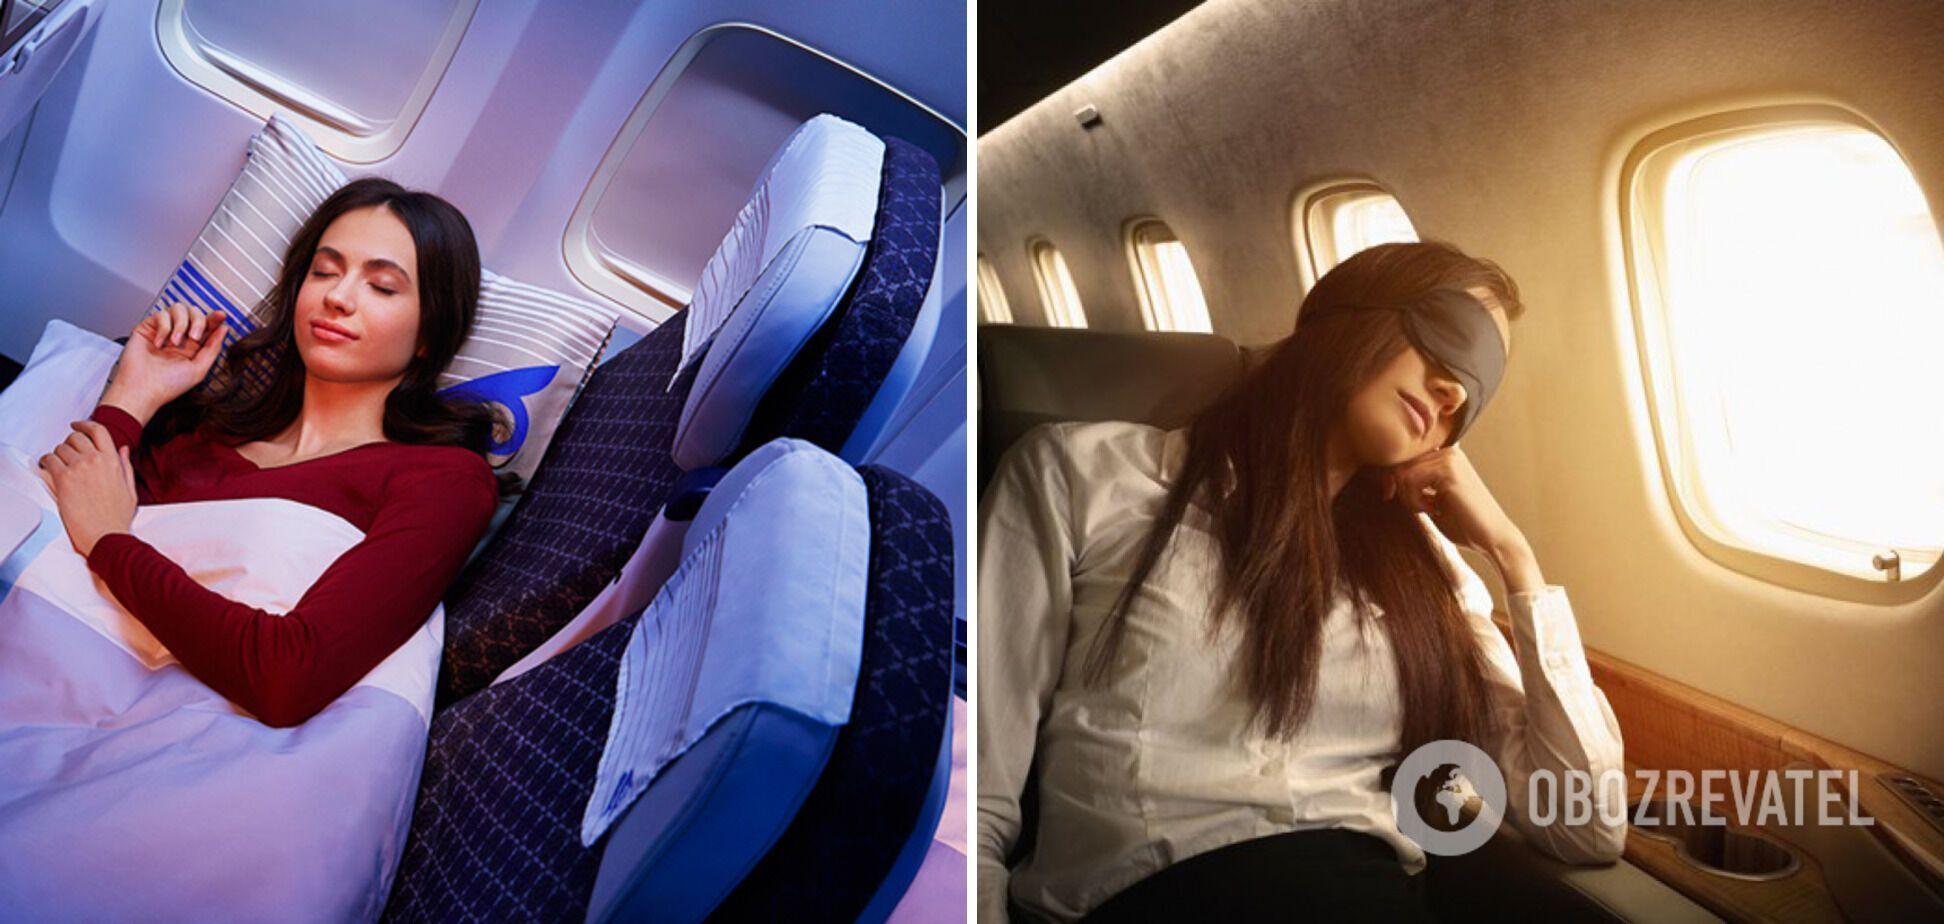 Пассажиры любят спать на борту самолета.